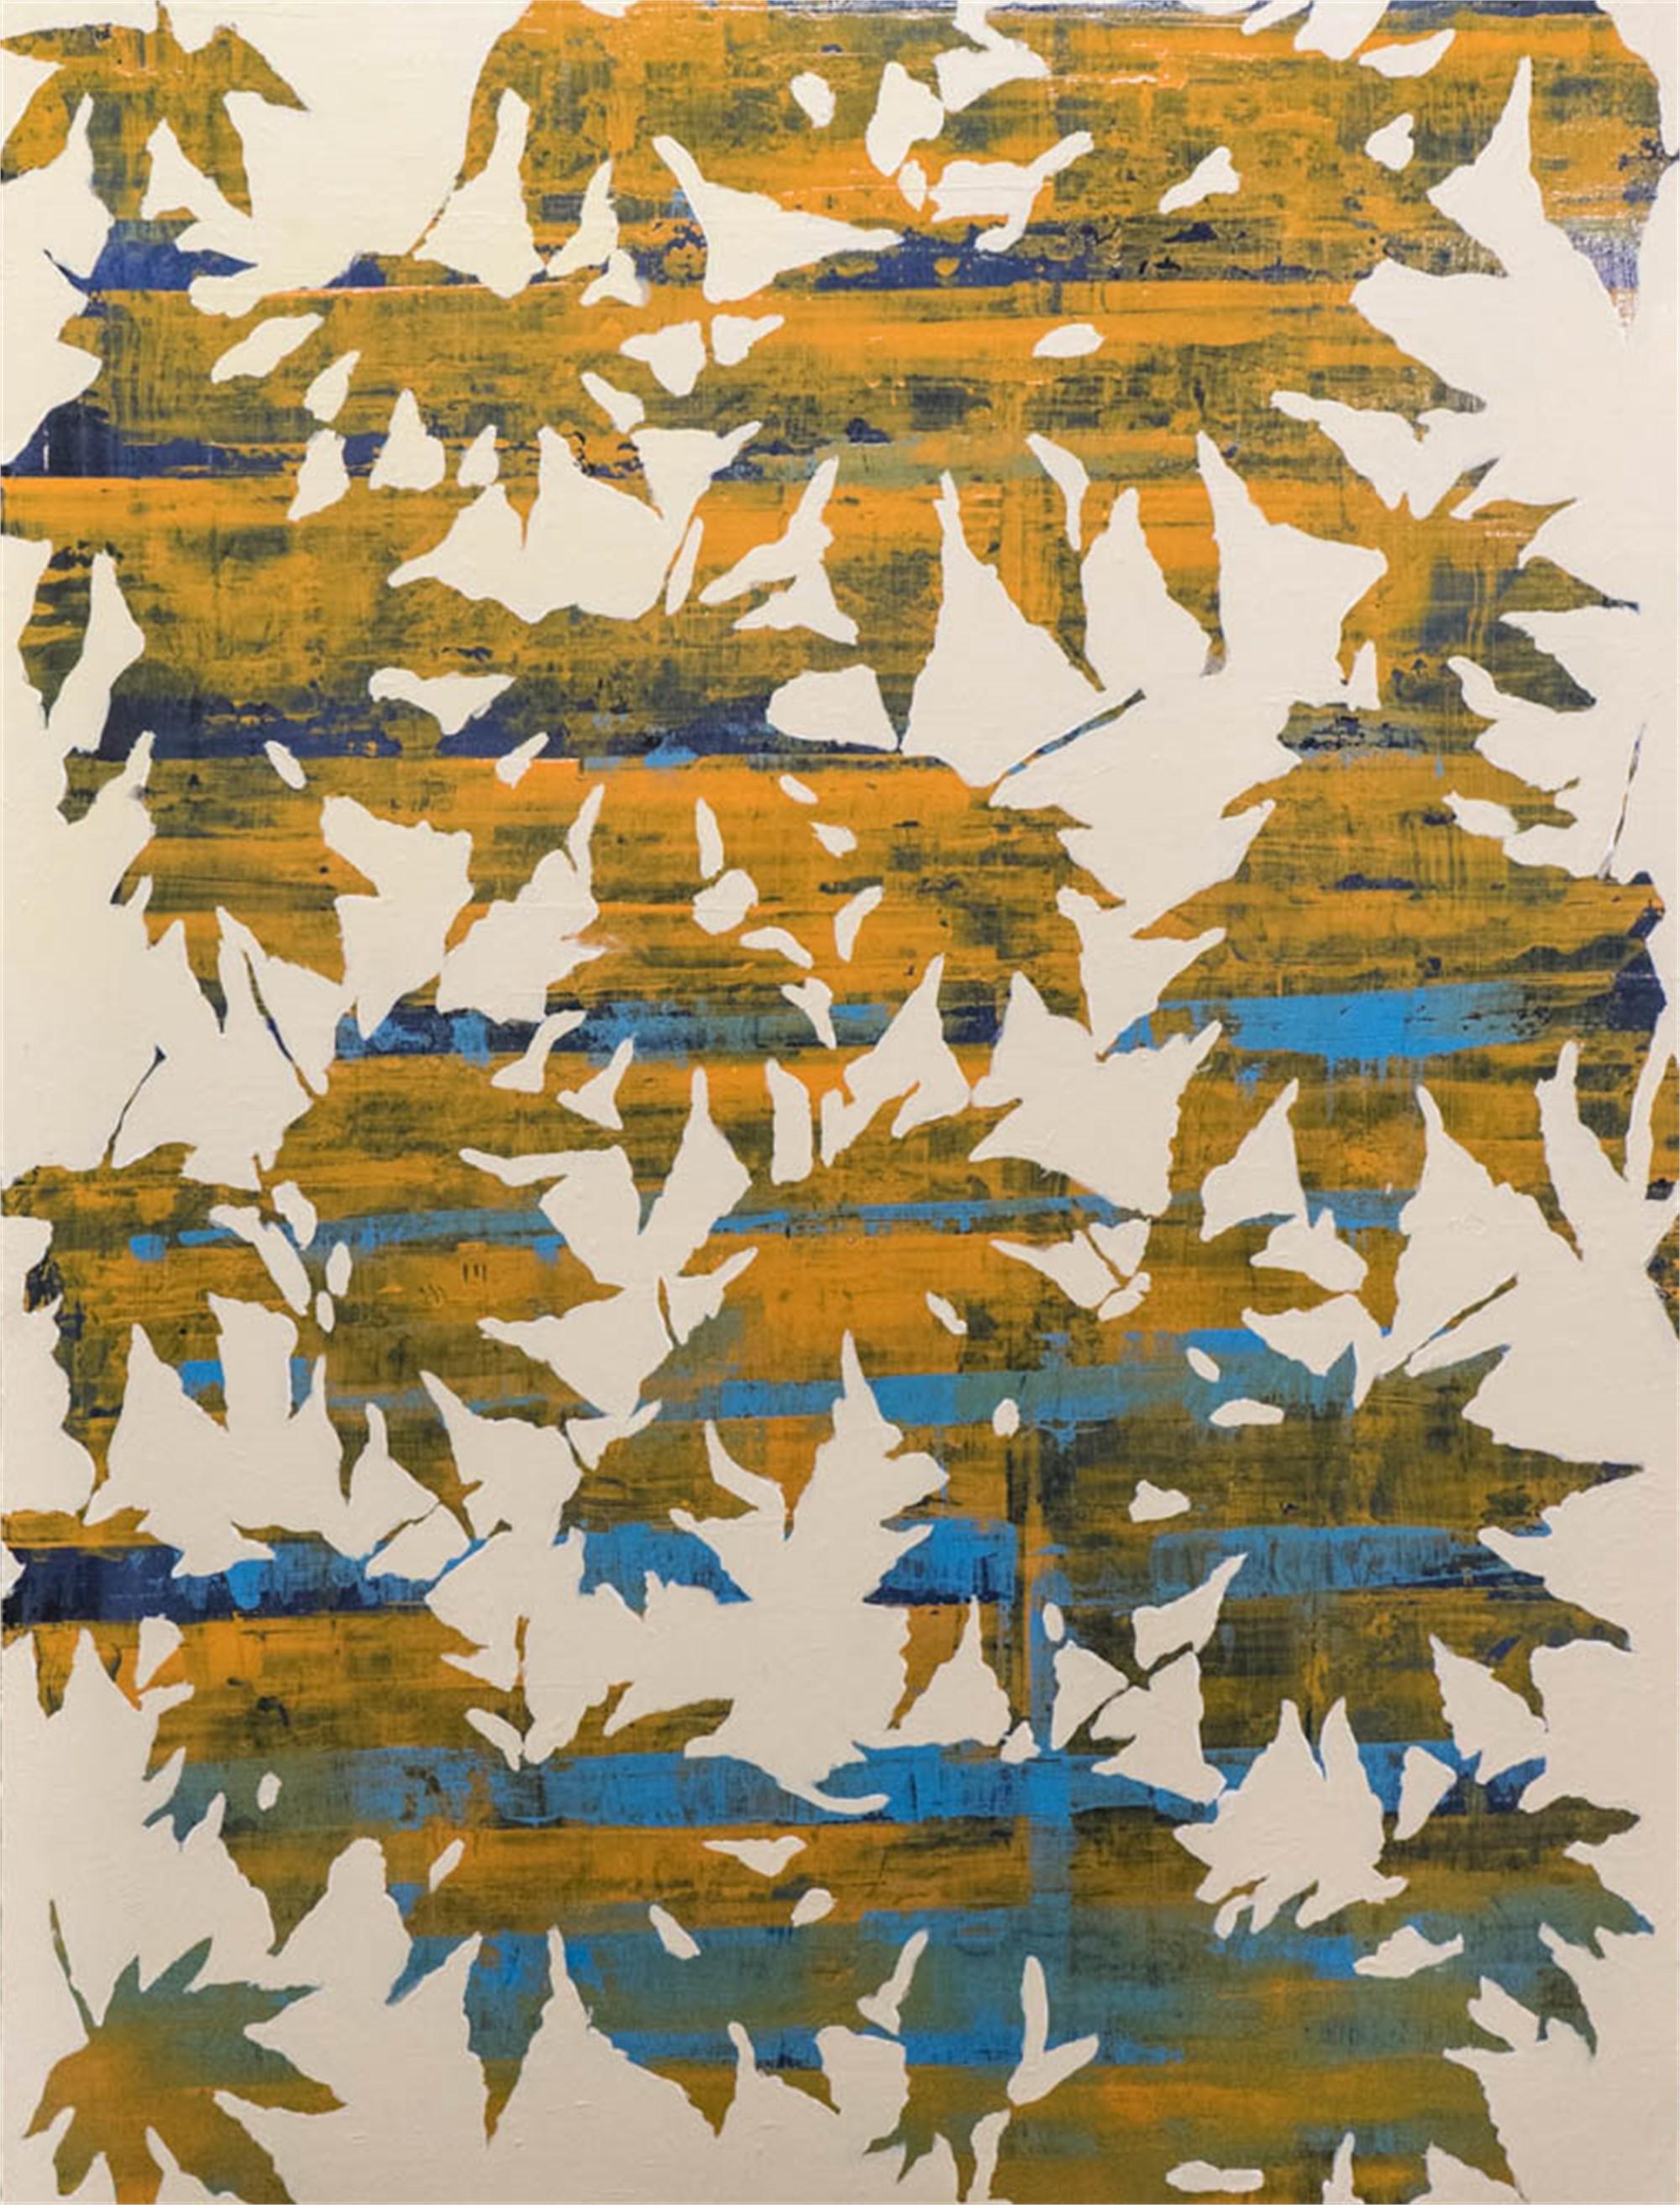 Leafy Landscape 1 by John Townsend